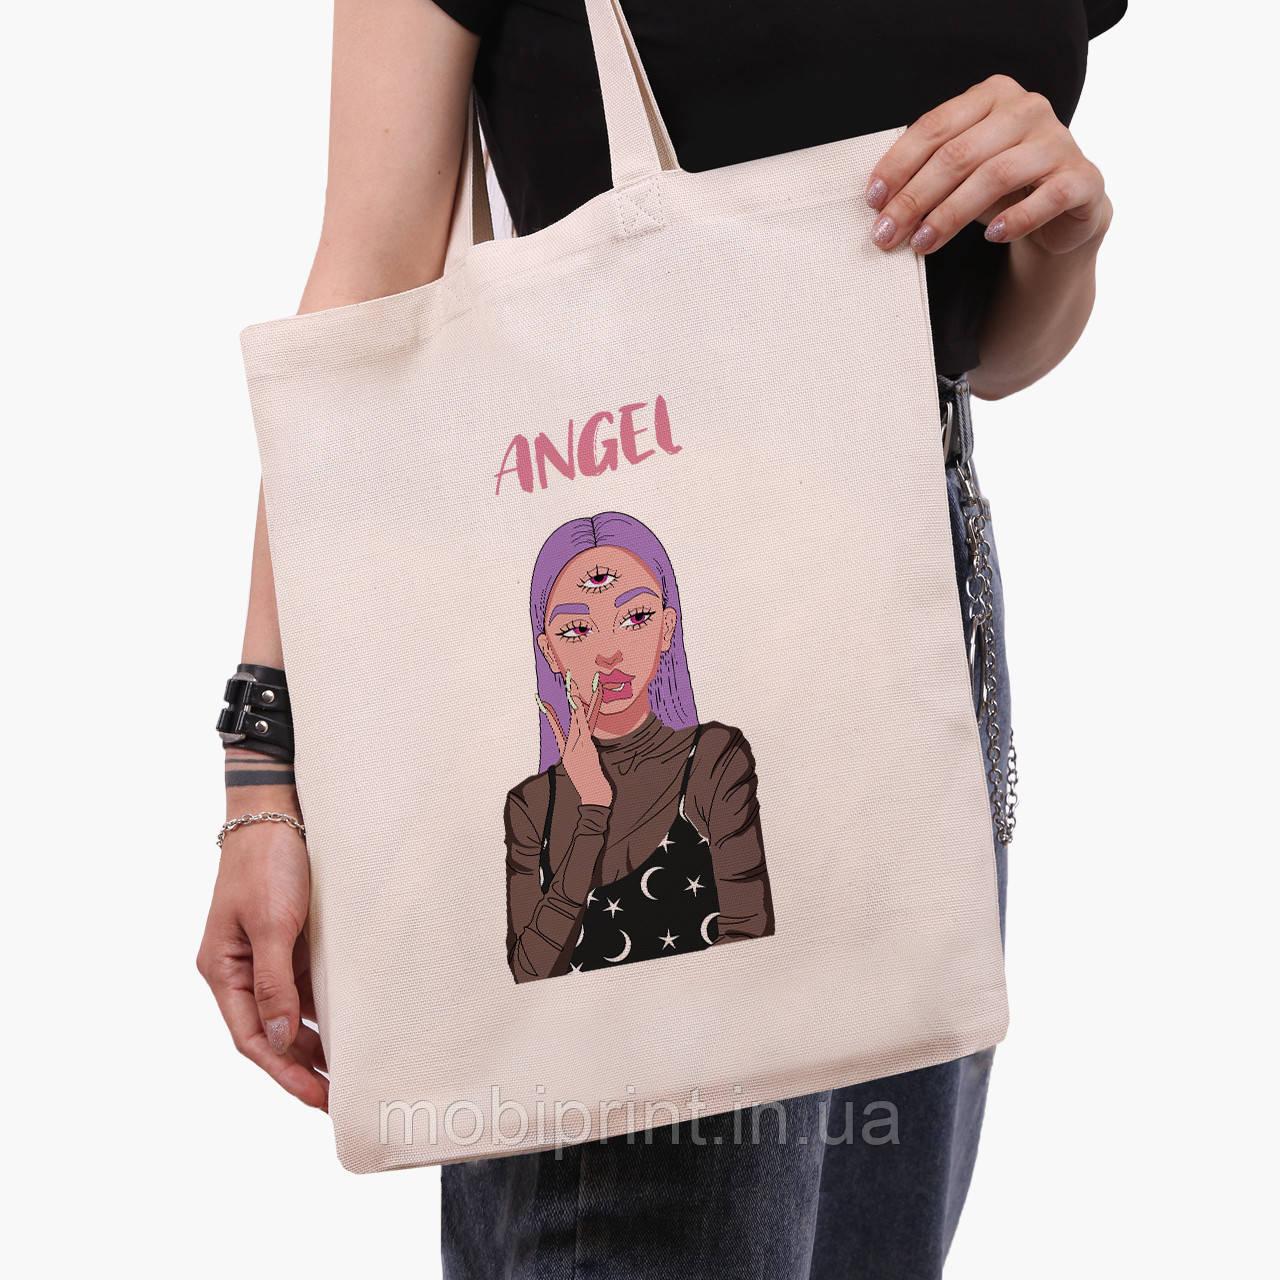 Эко сумка шоппер Ангел Диджитал Арт (Angel Digital art) (9227-1635)  экосумка шопер 41*35 см